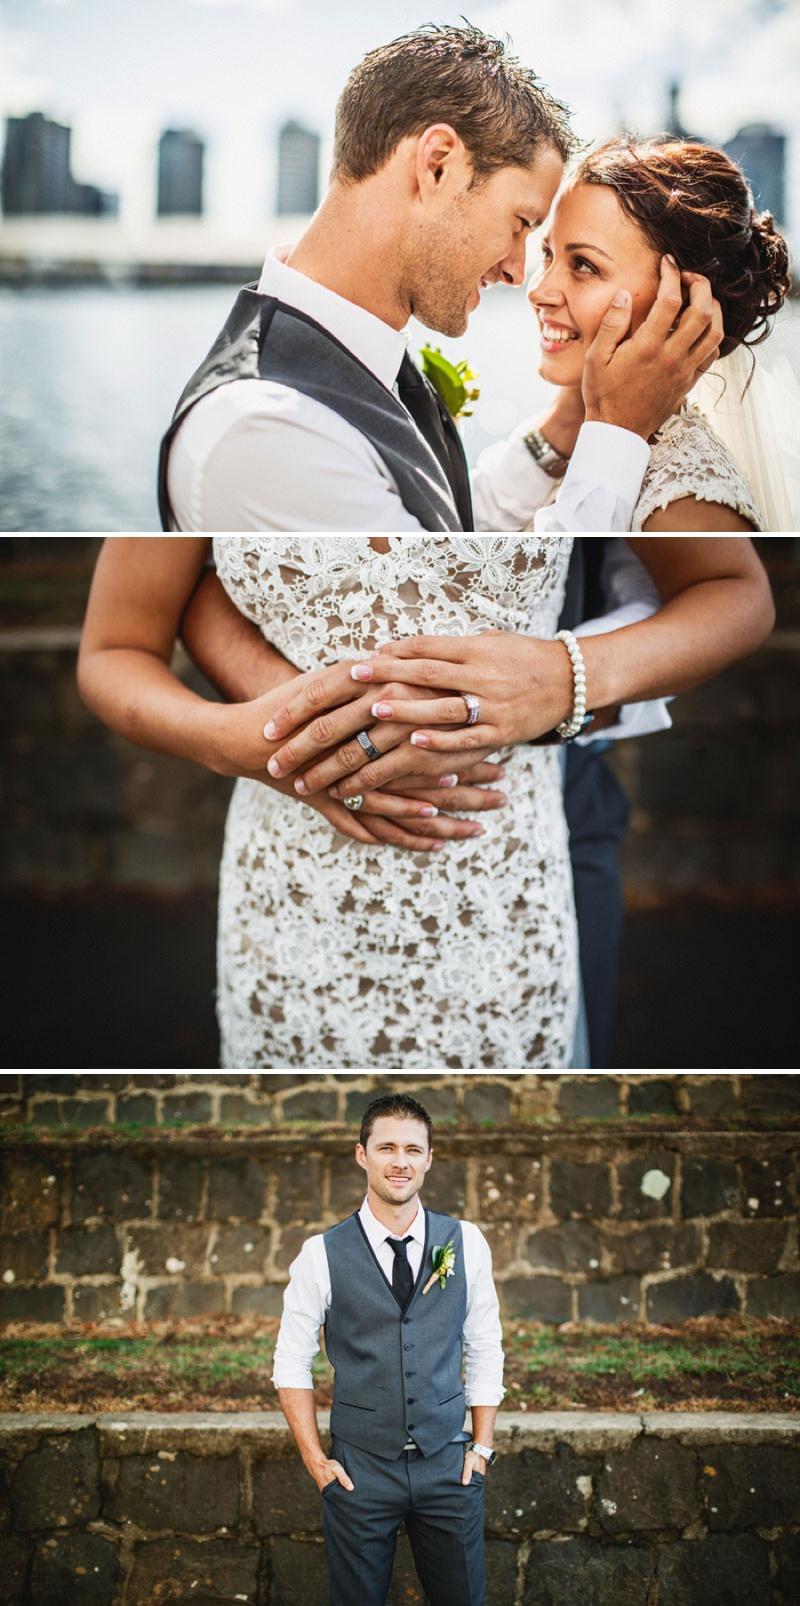 Lakshal Perera Wedding Photography Contemporary Reportage Melbourne Australia